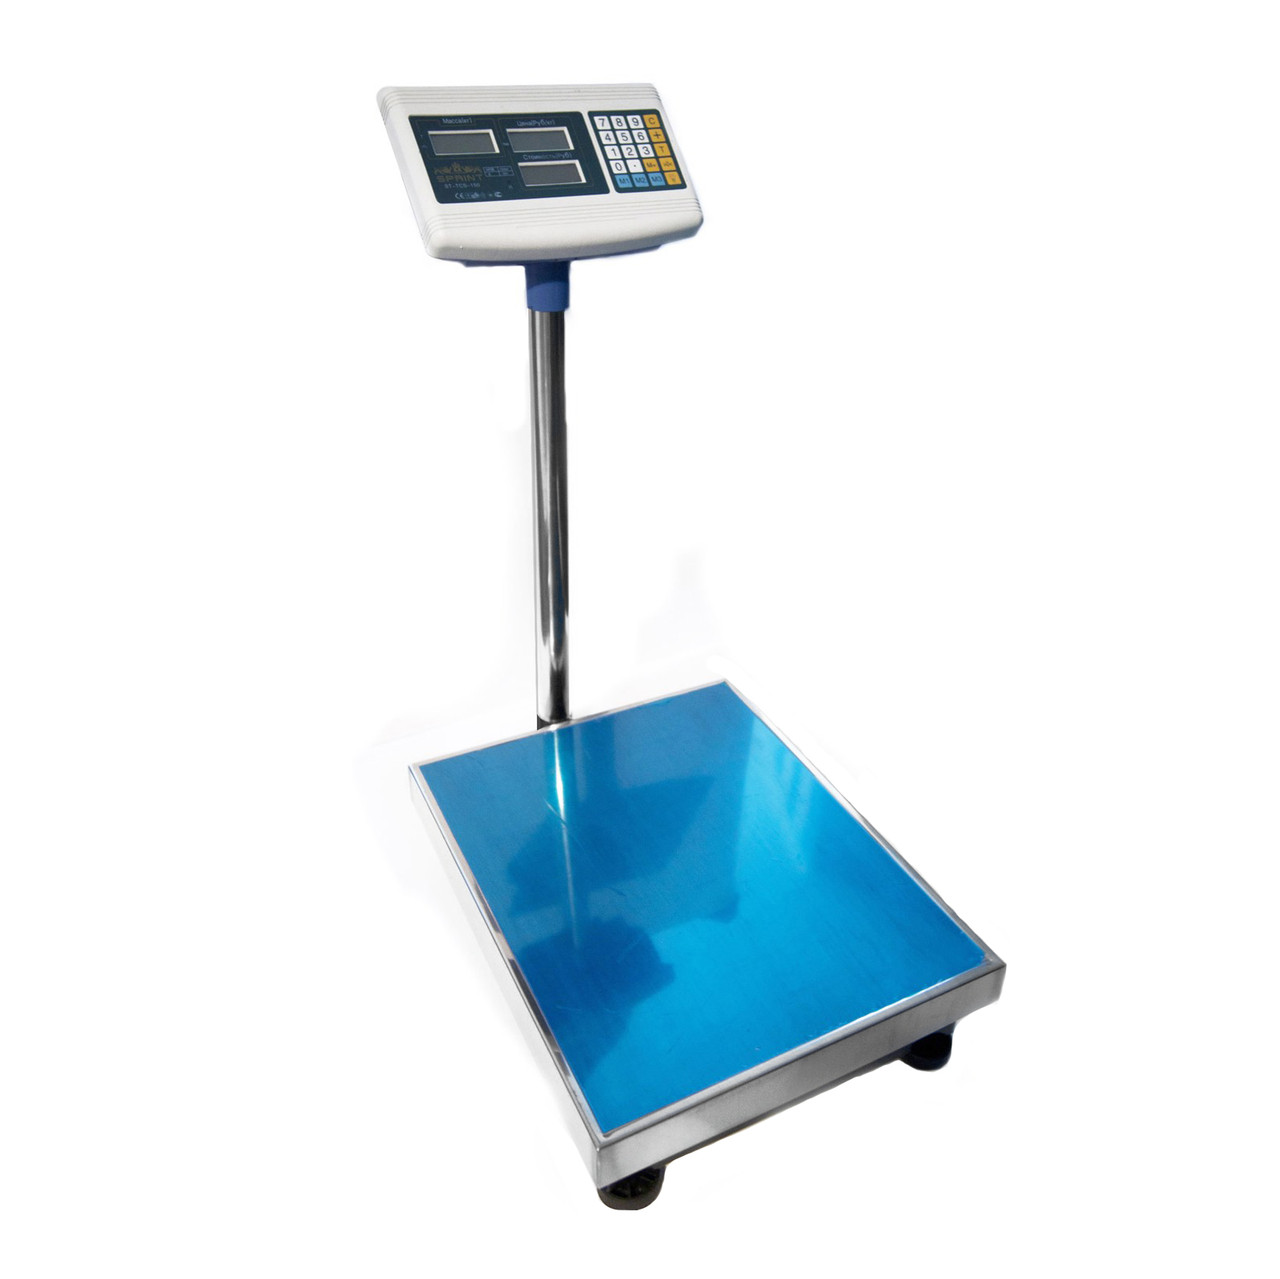 Весы 150кг электронные напольные